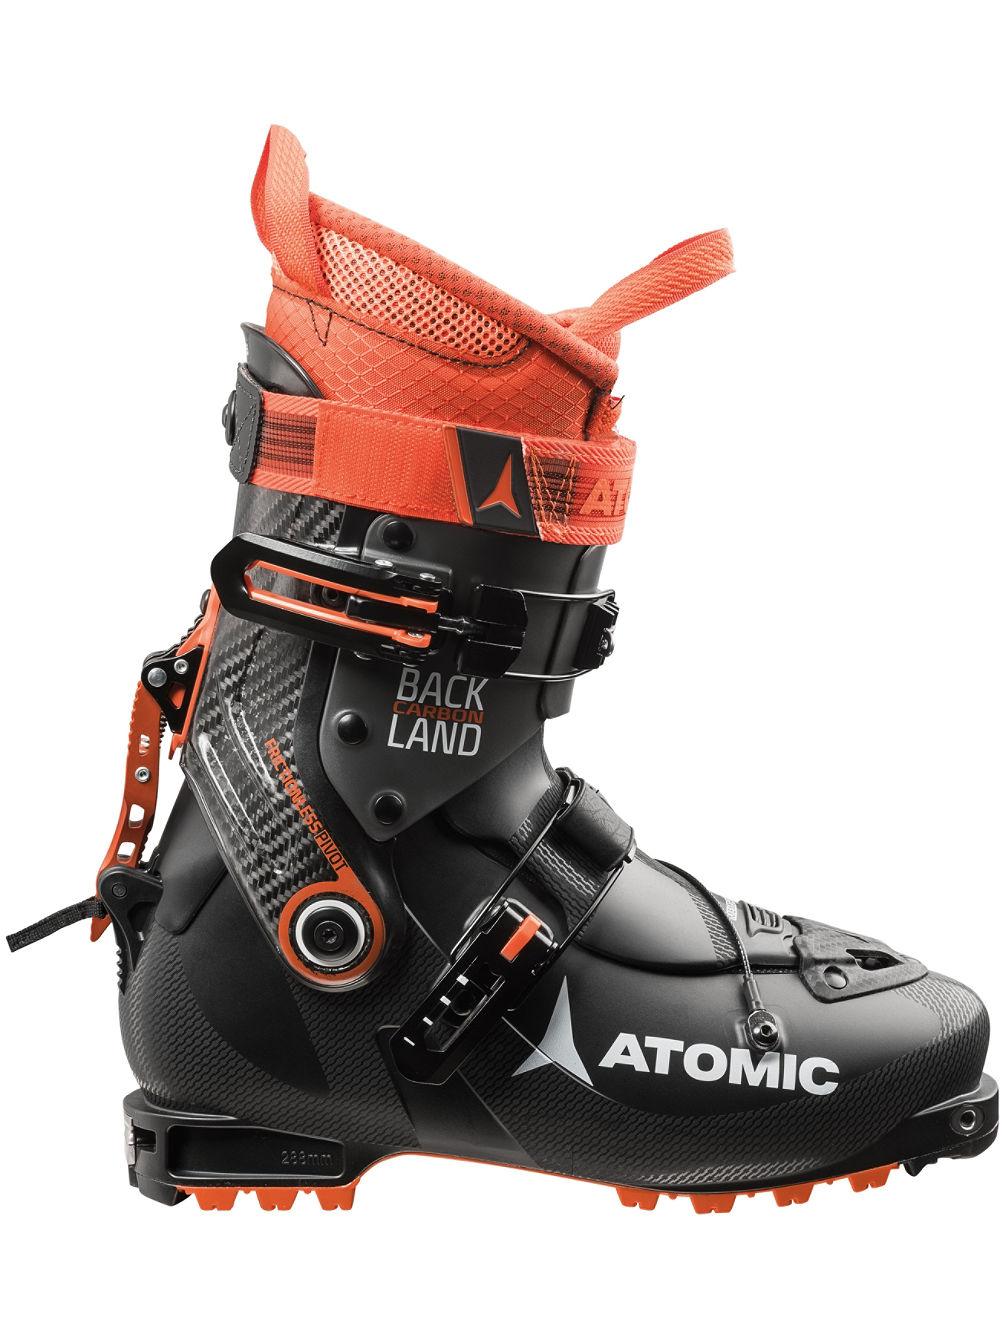 b712a81e71f Atomic Backland Carbon 2018 Skischoenen online kopen bij blue-tomato.com